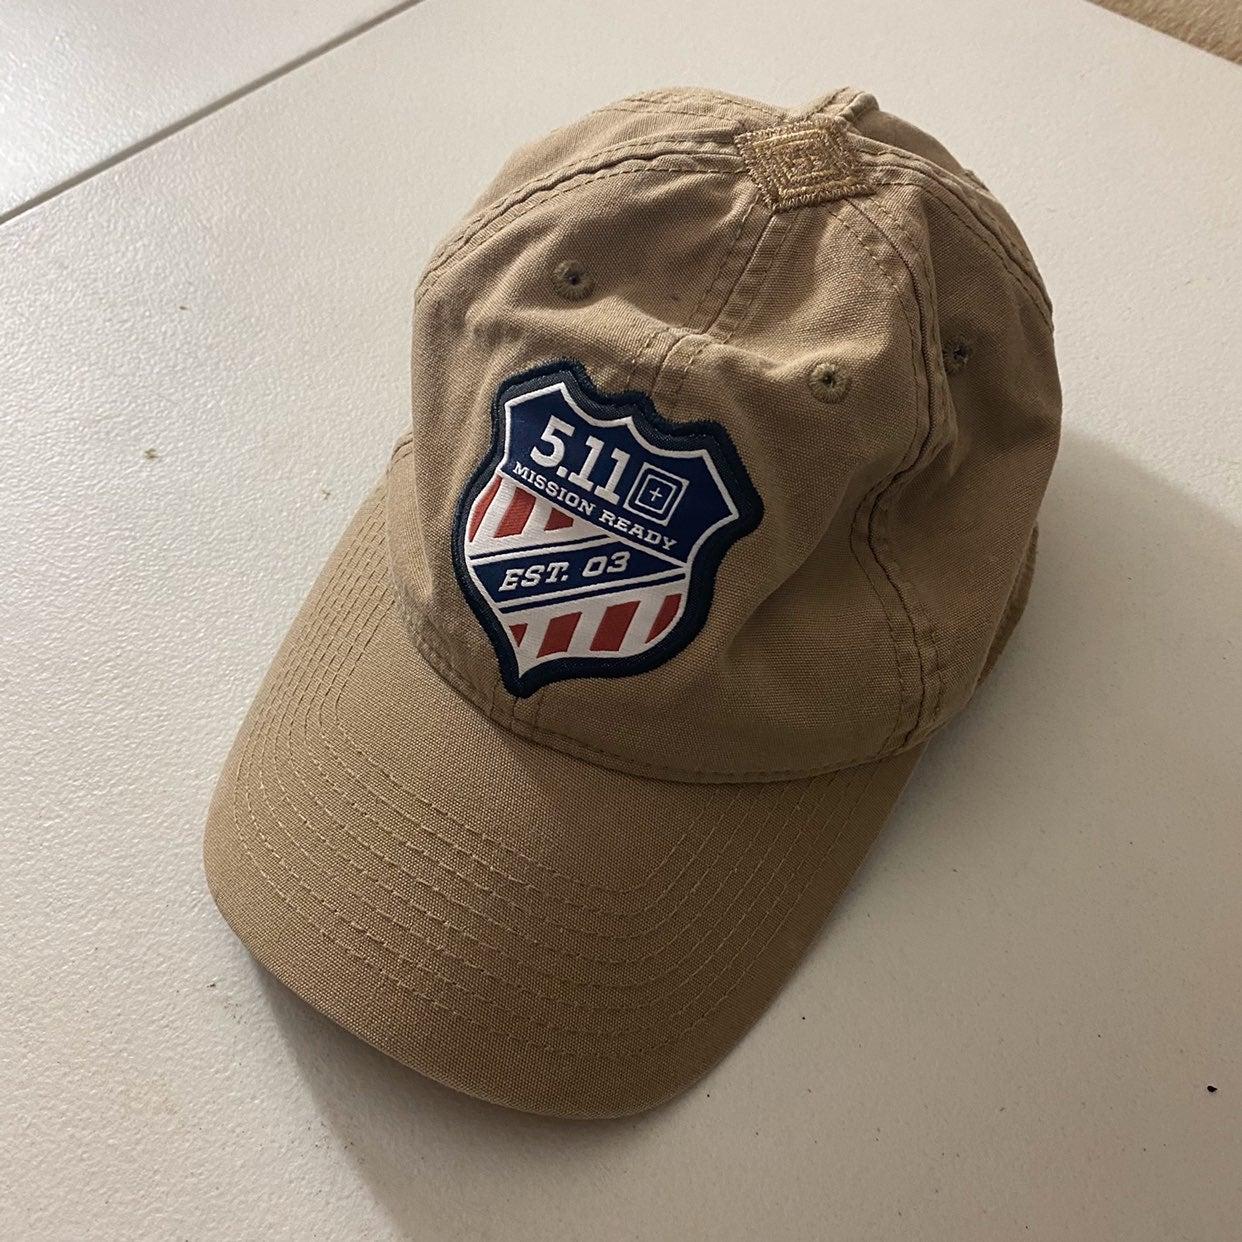 Nice 5.11 Tactical hat. Unused